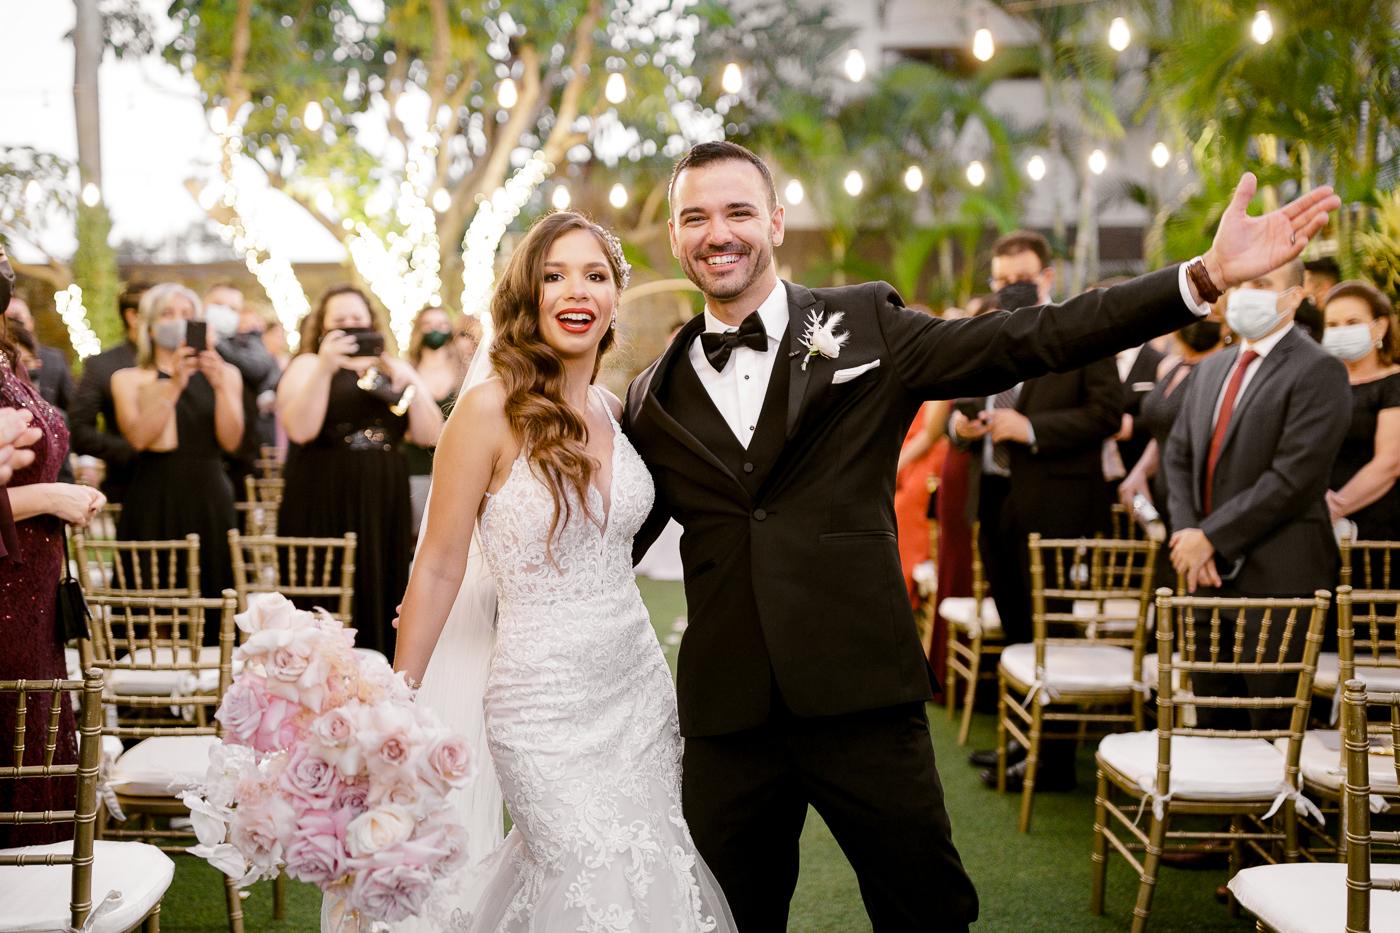 Karen & Caio – ceremony (10 of 10)